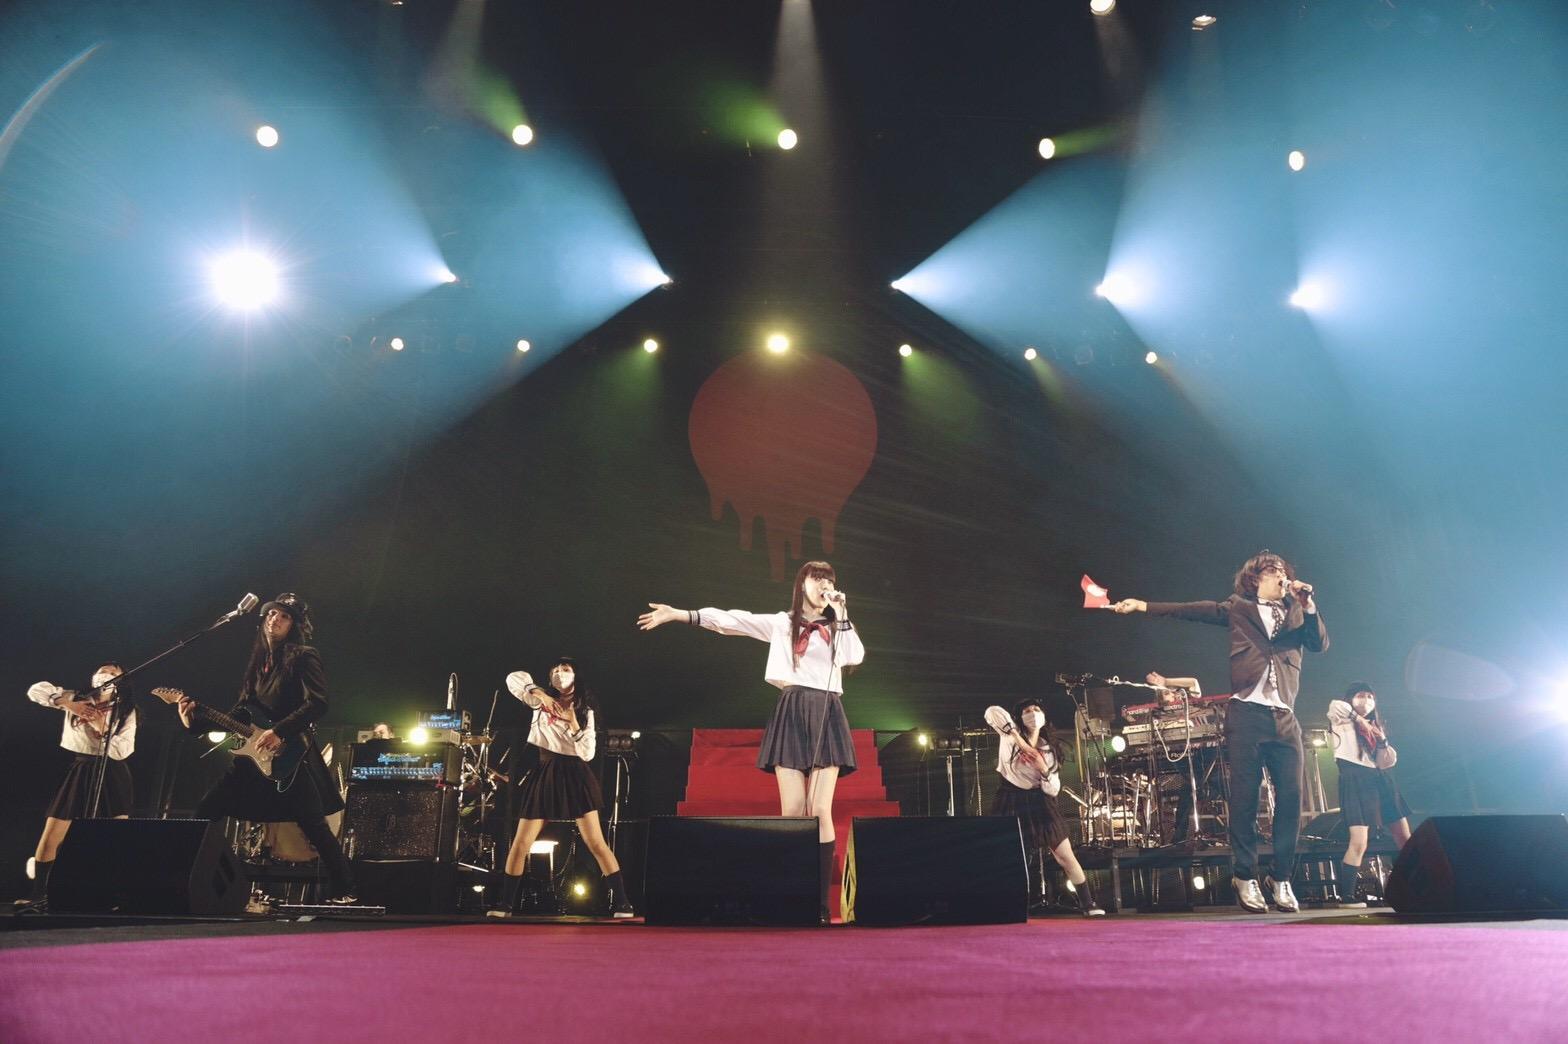 RMMS-URBANGARDE-Ai-to-Gensou-no-URBANGARDE-announce7-Kekkon-Shiki-liveC